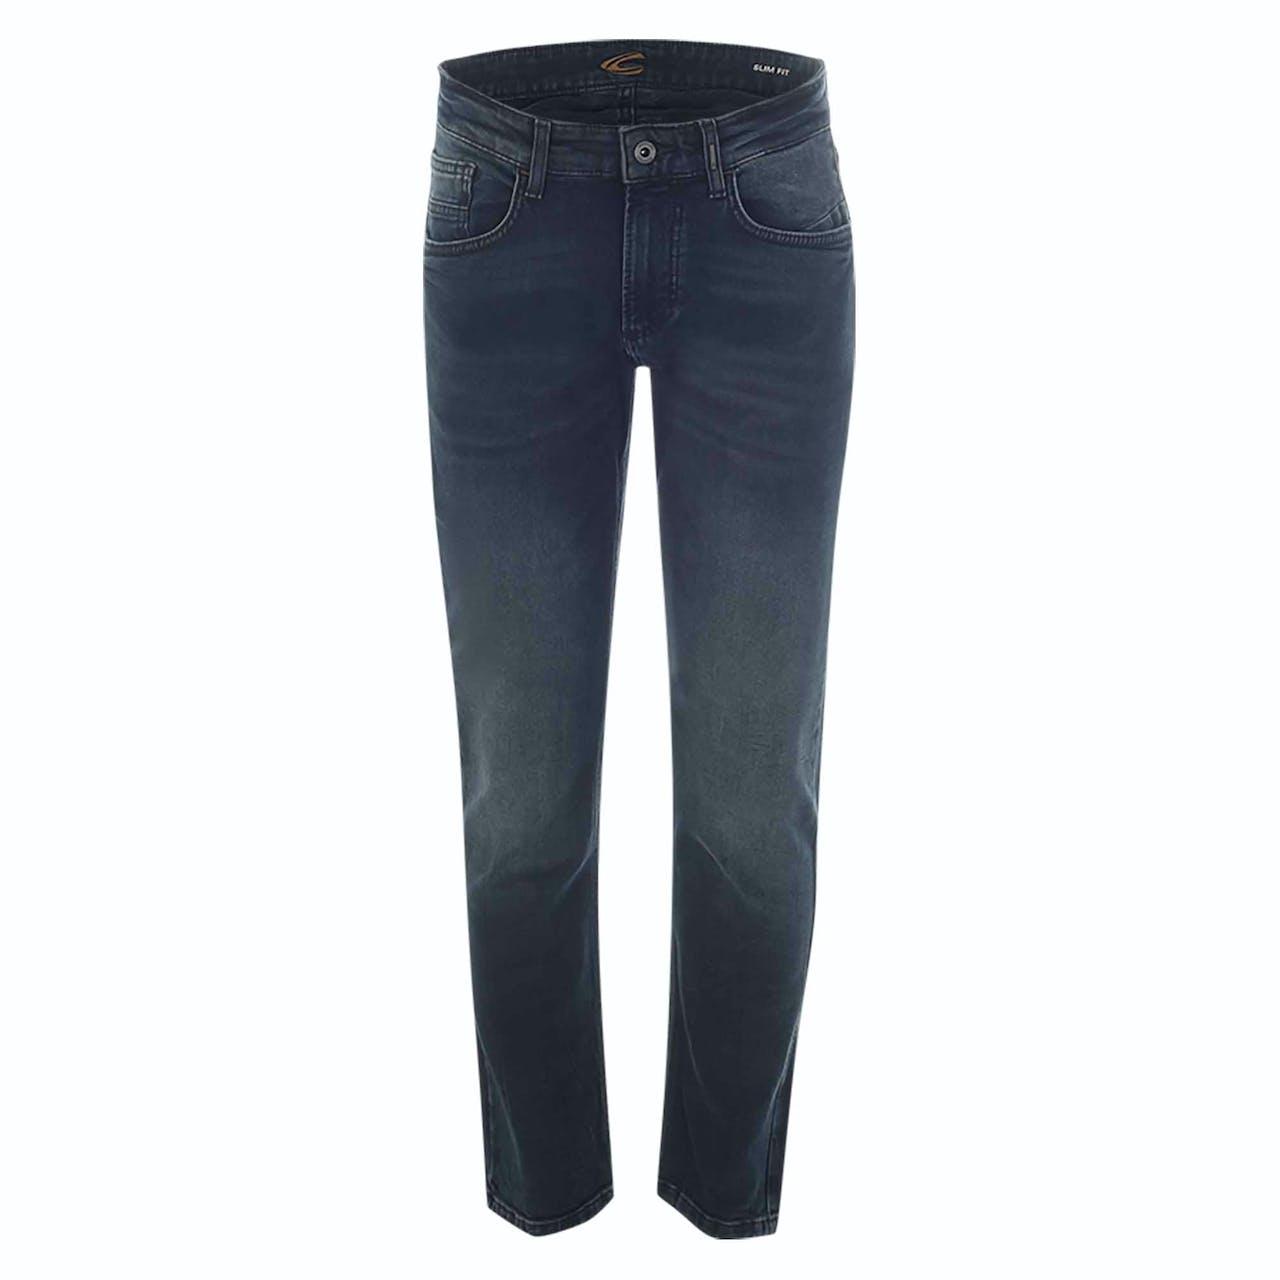 Jeans - Slim Fit - Madison